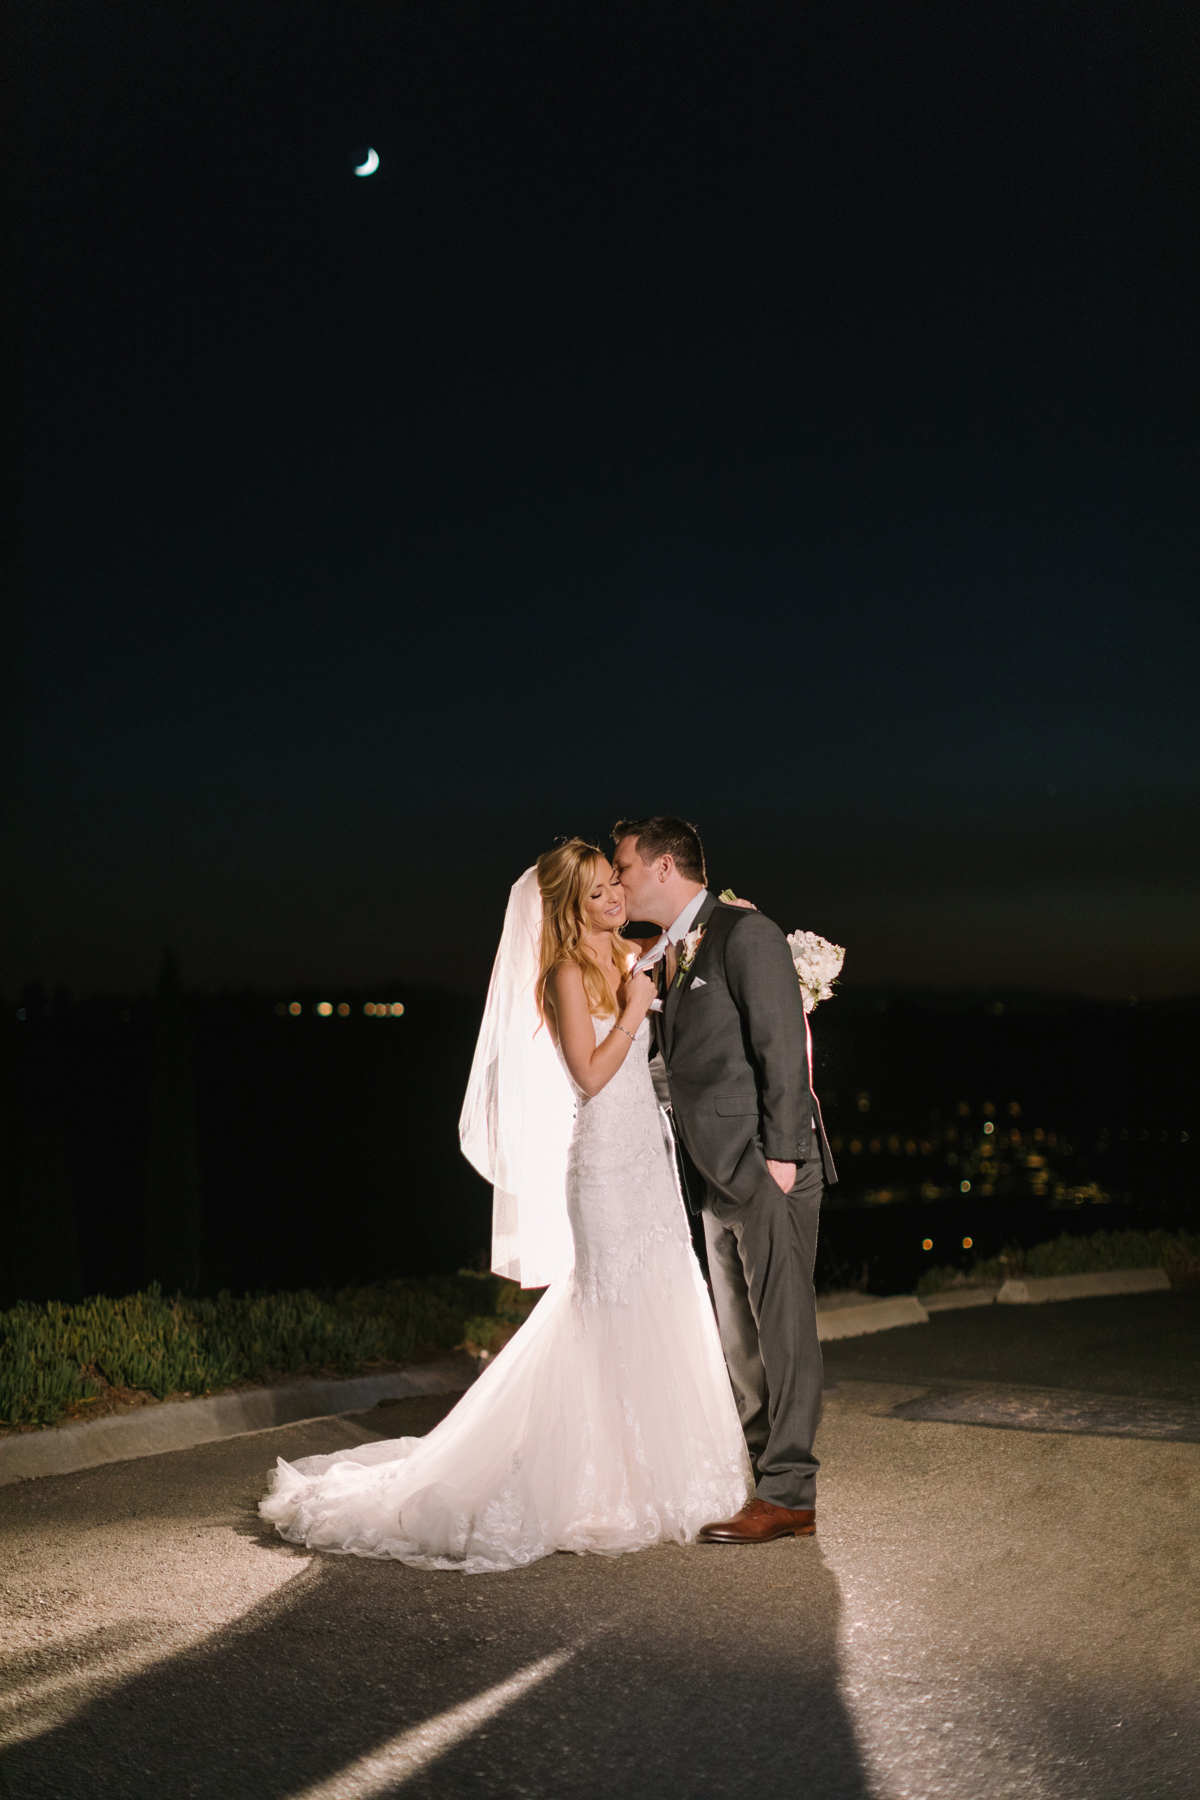 Orange-County-Wedding-Photography-Brianna-Caster-and-Co-Photographers-Falkner-Winery-Wedding-17